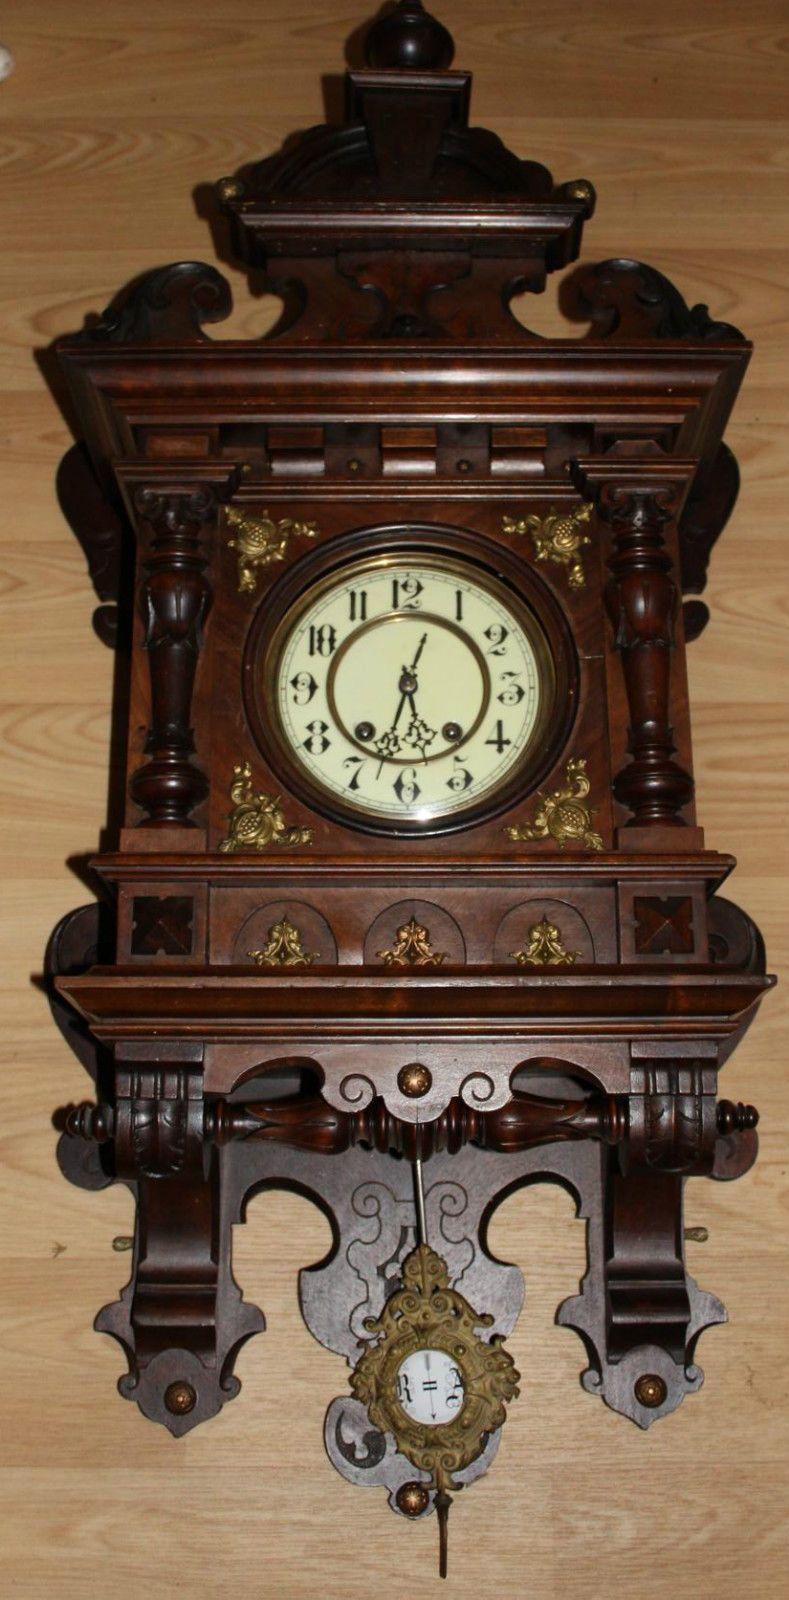 Reinhold Schnekenburger Muhlheim Wanduhr Regulator Freischwinger Xxl Bilder Ebay Wanduhren Uhren Standuhren